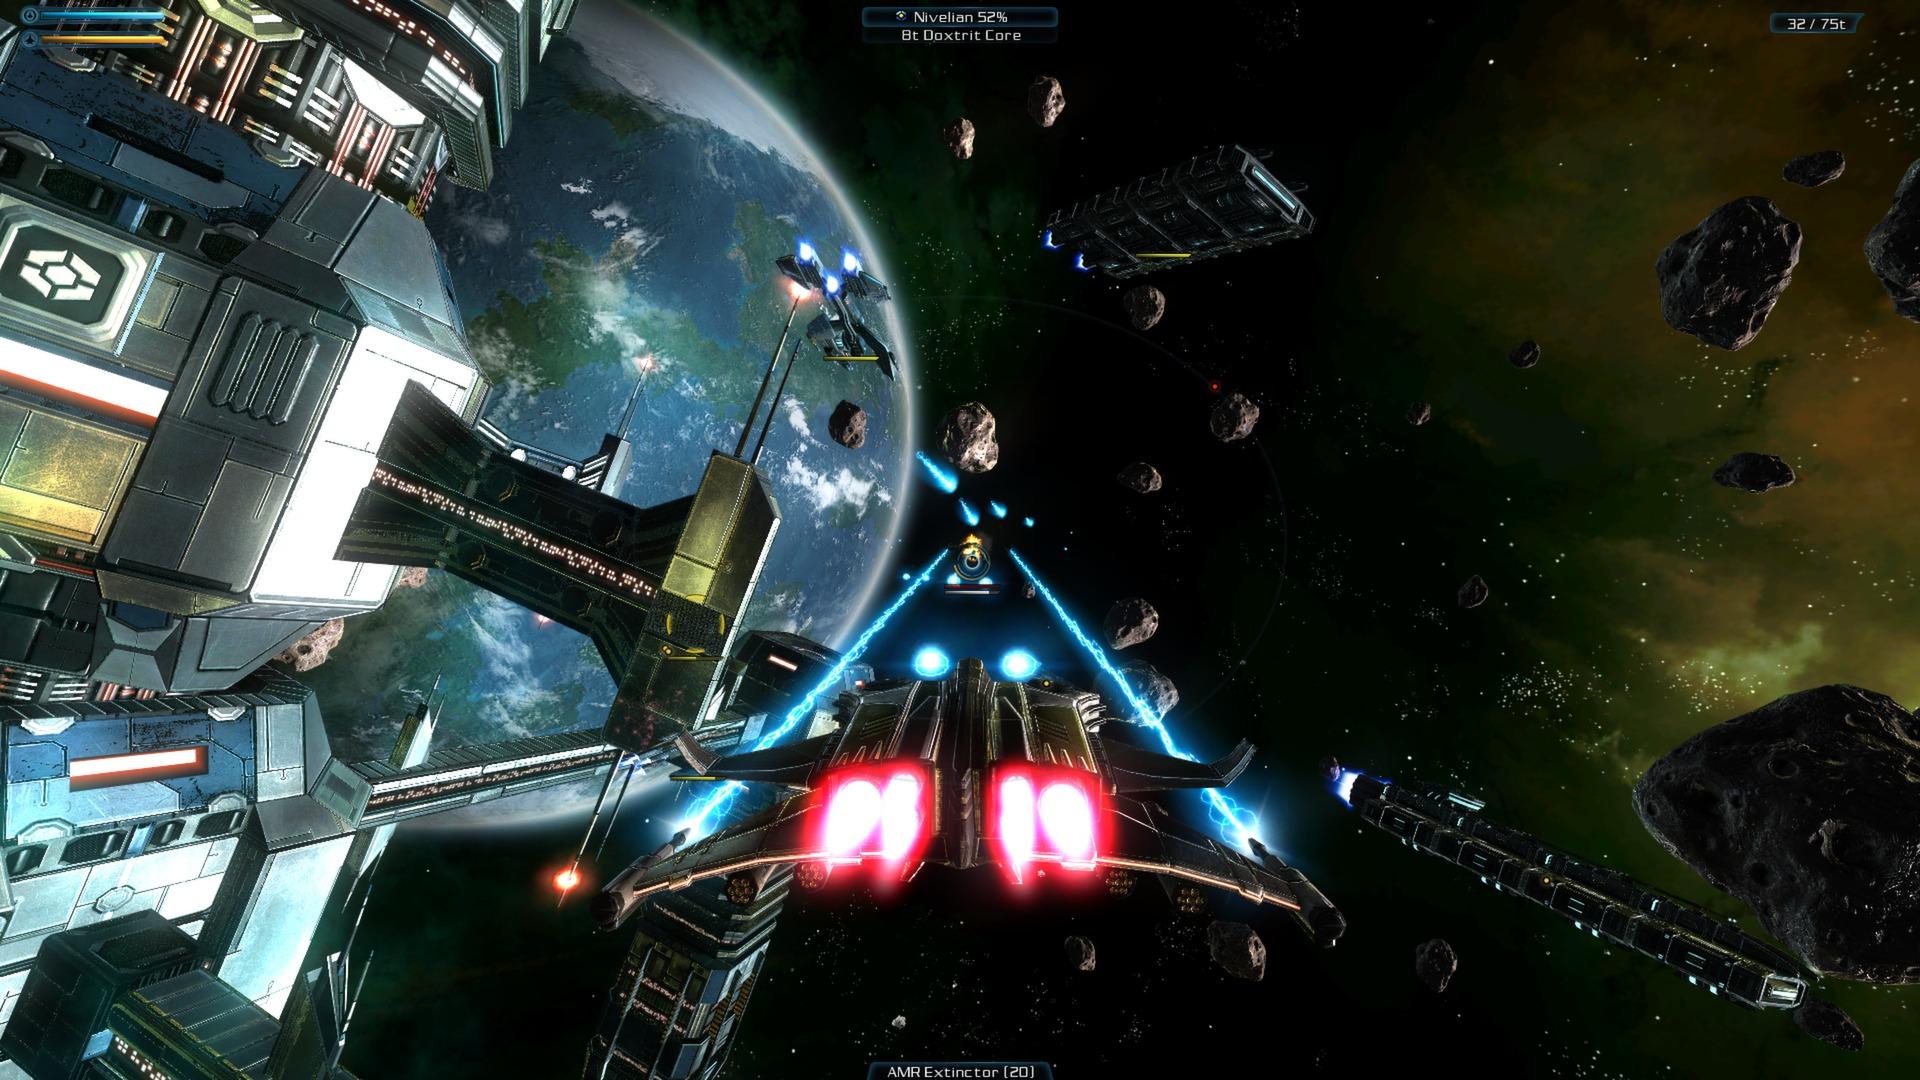 9 игр для андроид, работающих без интернета - galaxy on fire 2